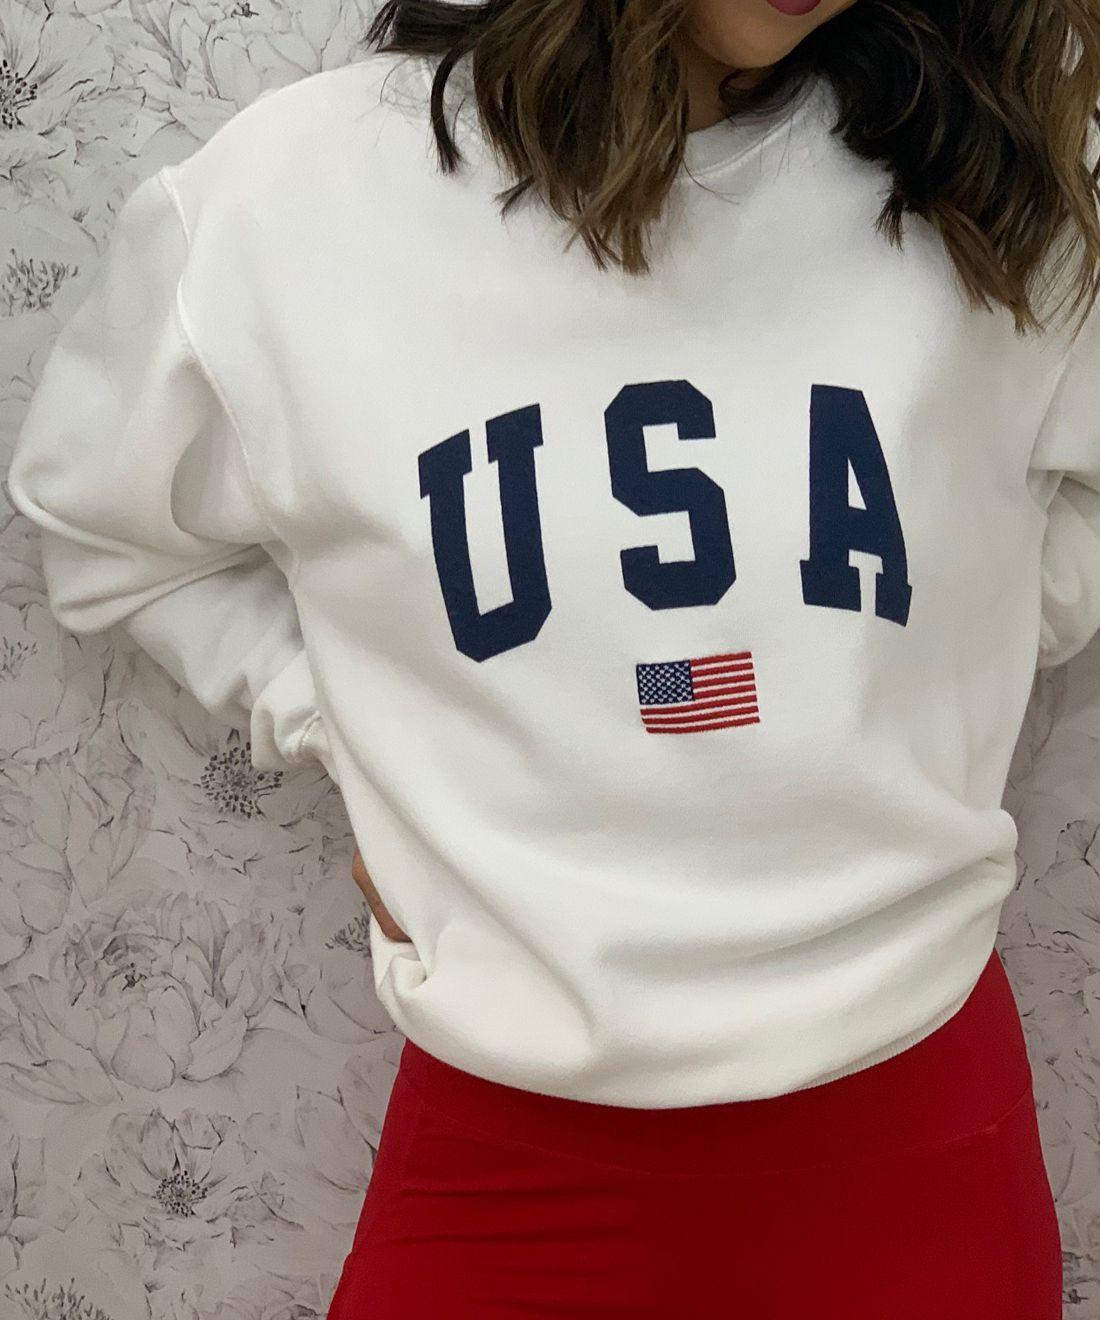 Peonies & Anemones White Floral Wallpaper • Girl in USA jumper in front of White Floral Wallpaper